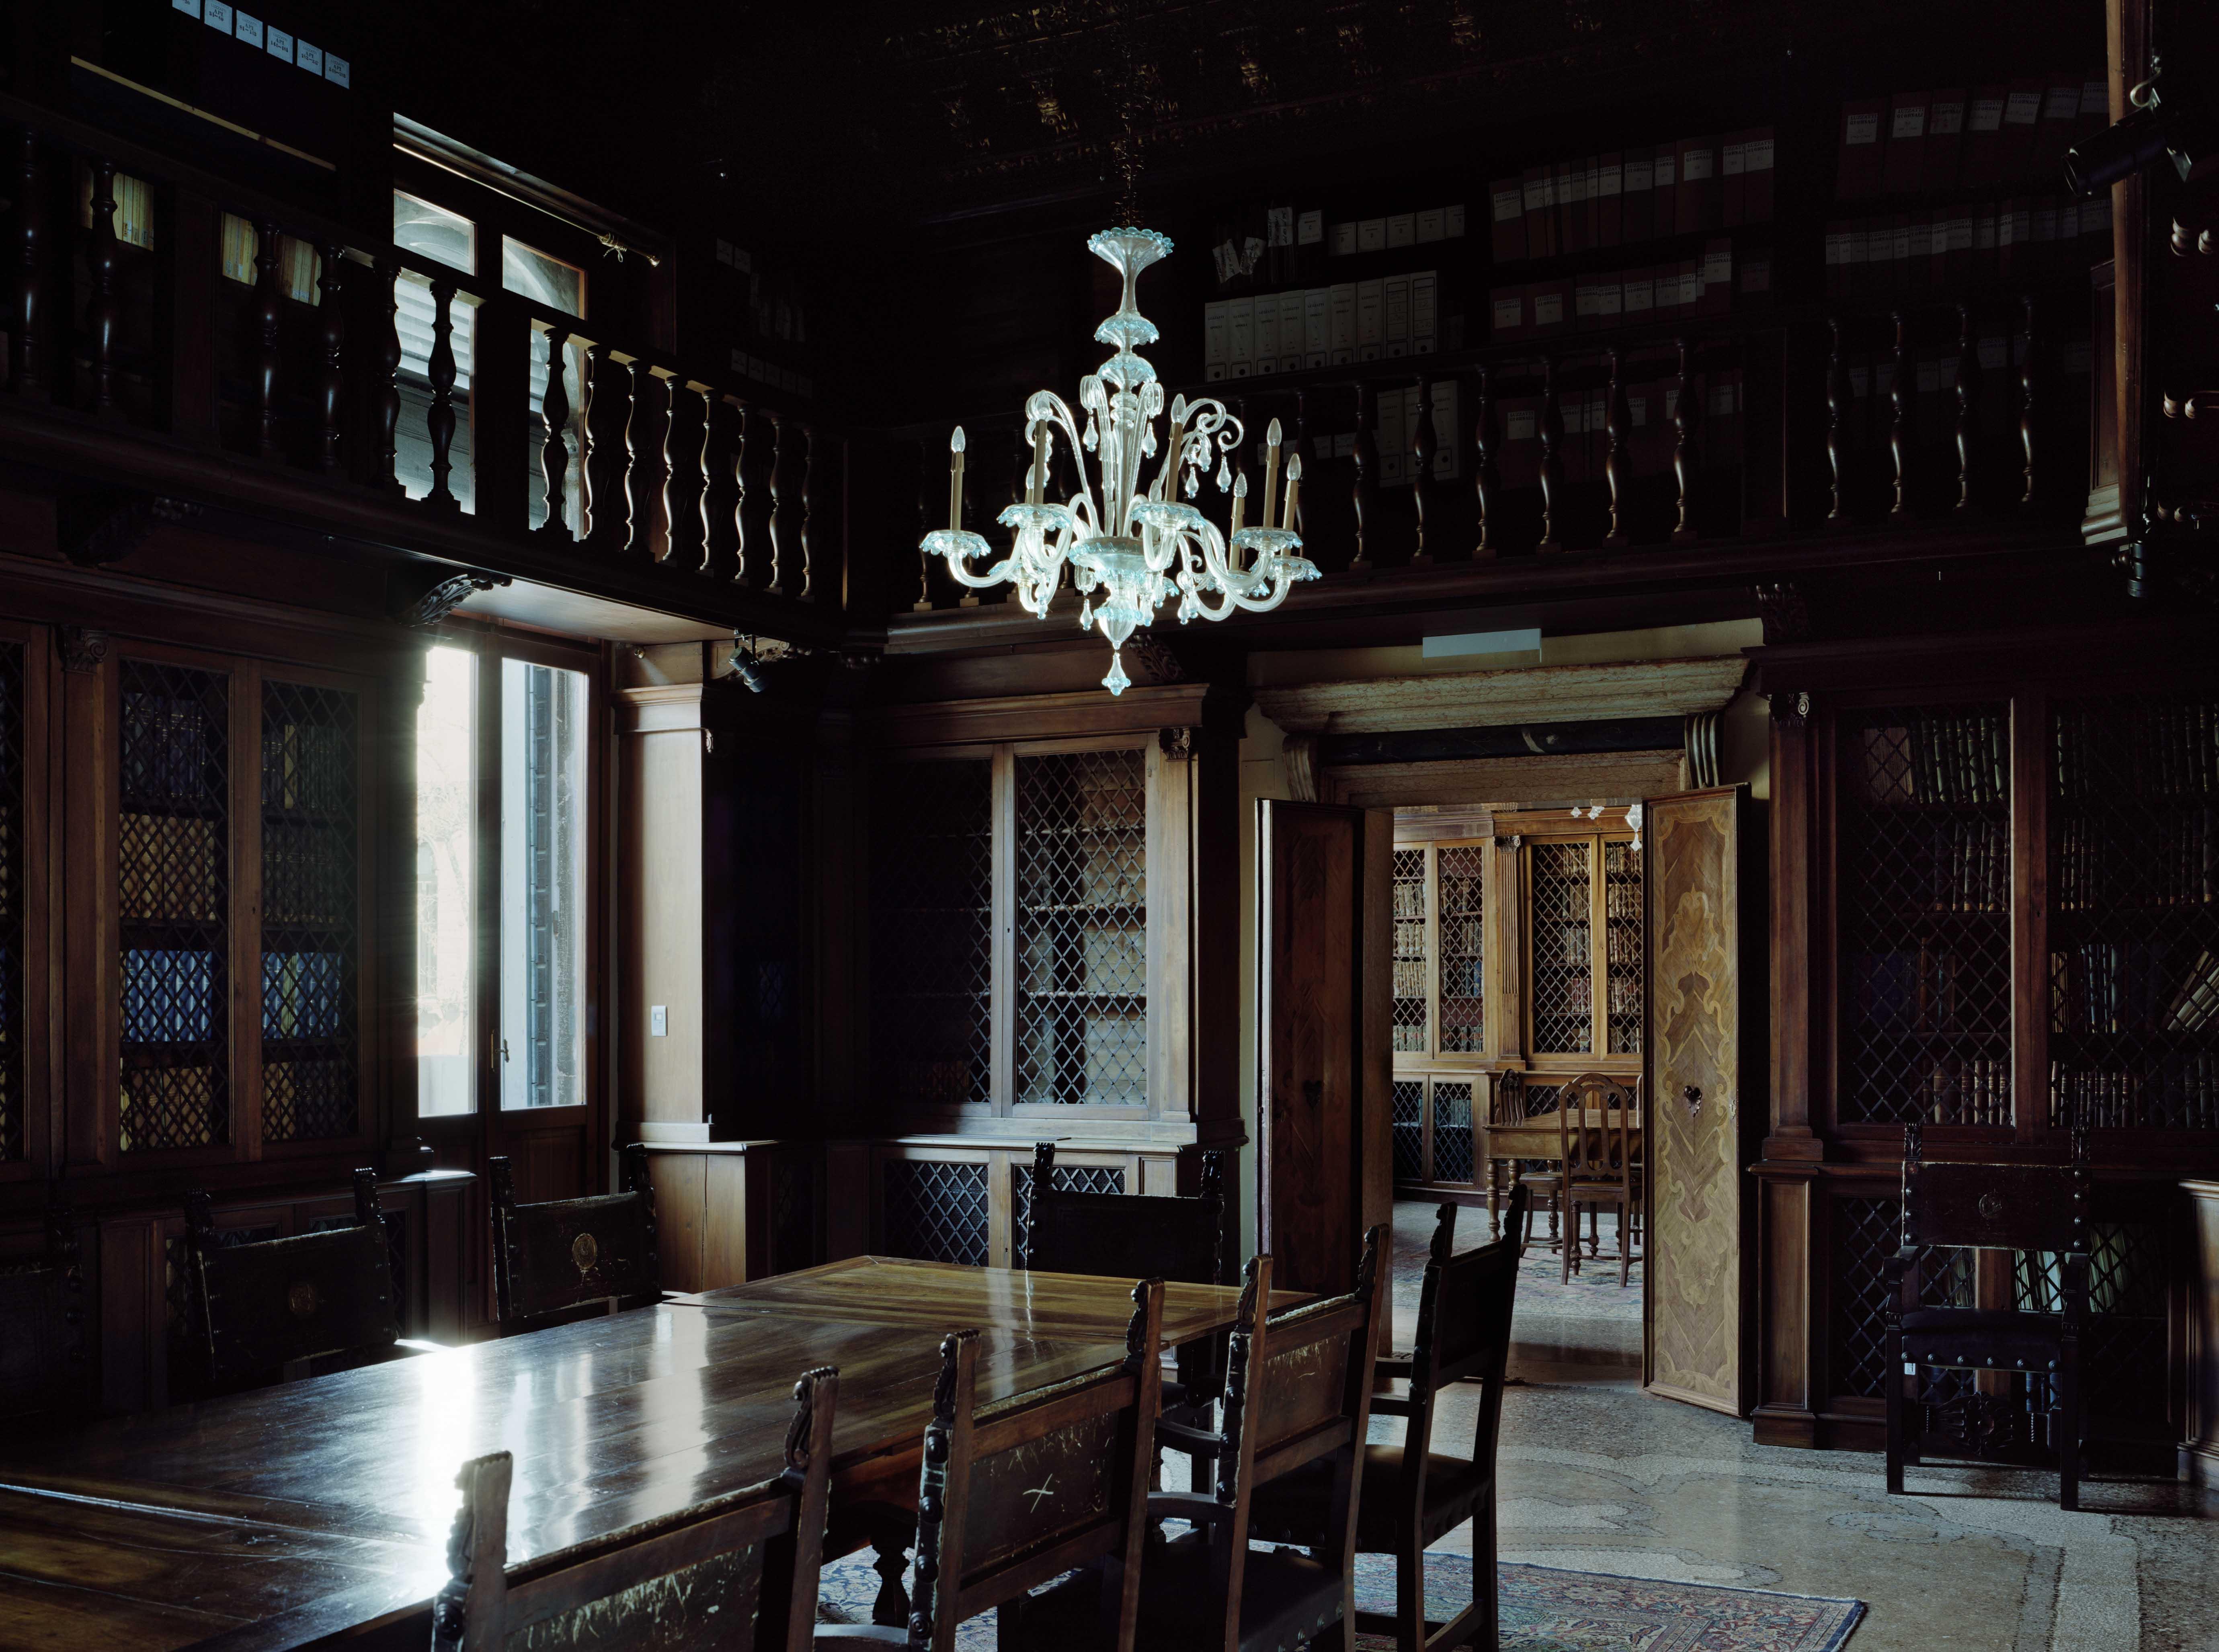 Palazzo Loredan-2, Italy, 2012?58 x 69 cm?printed on glass